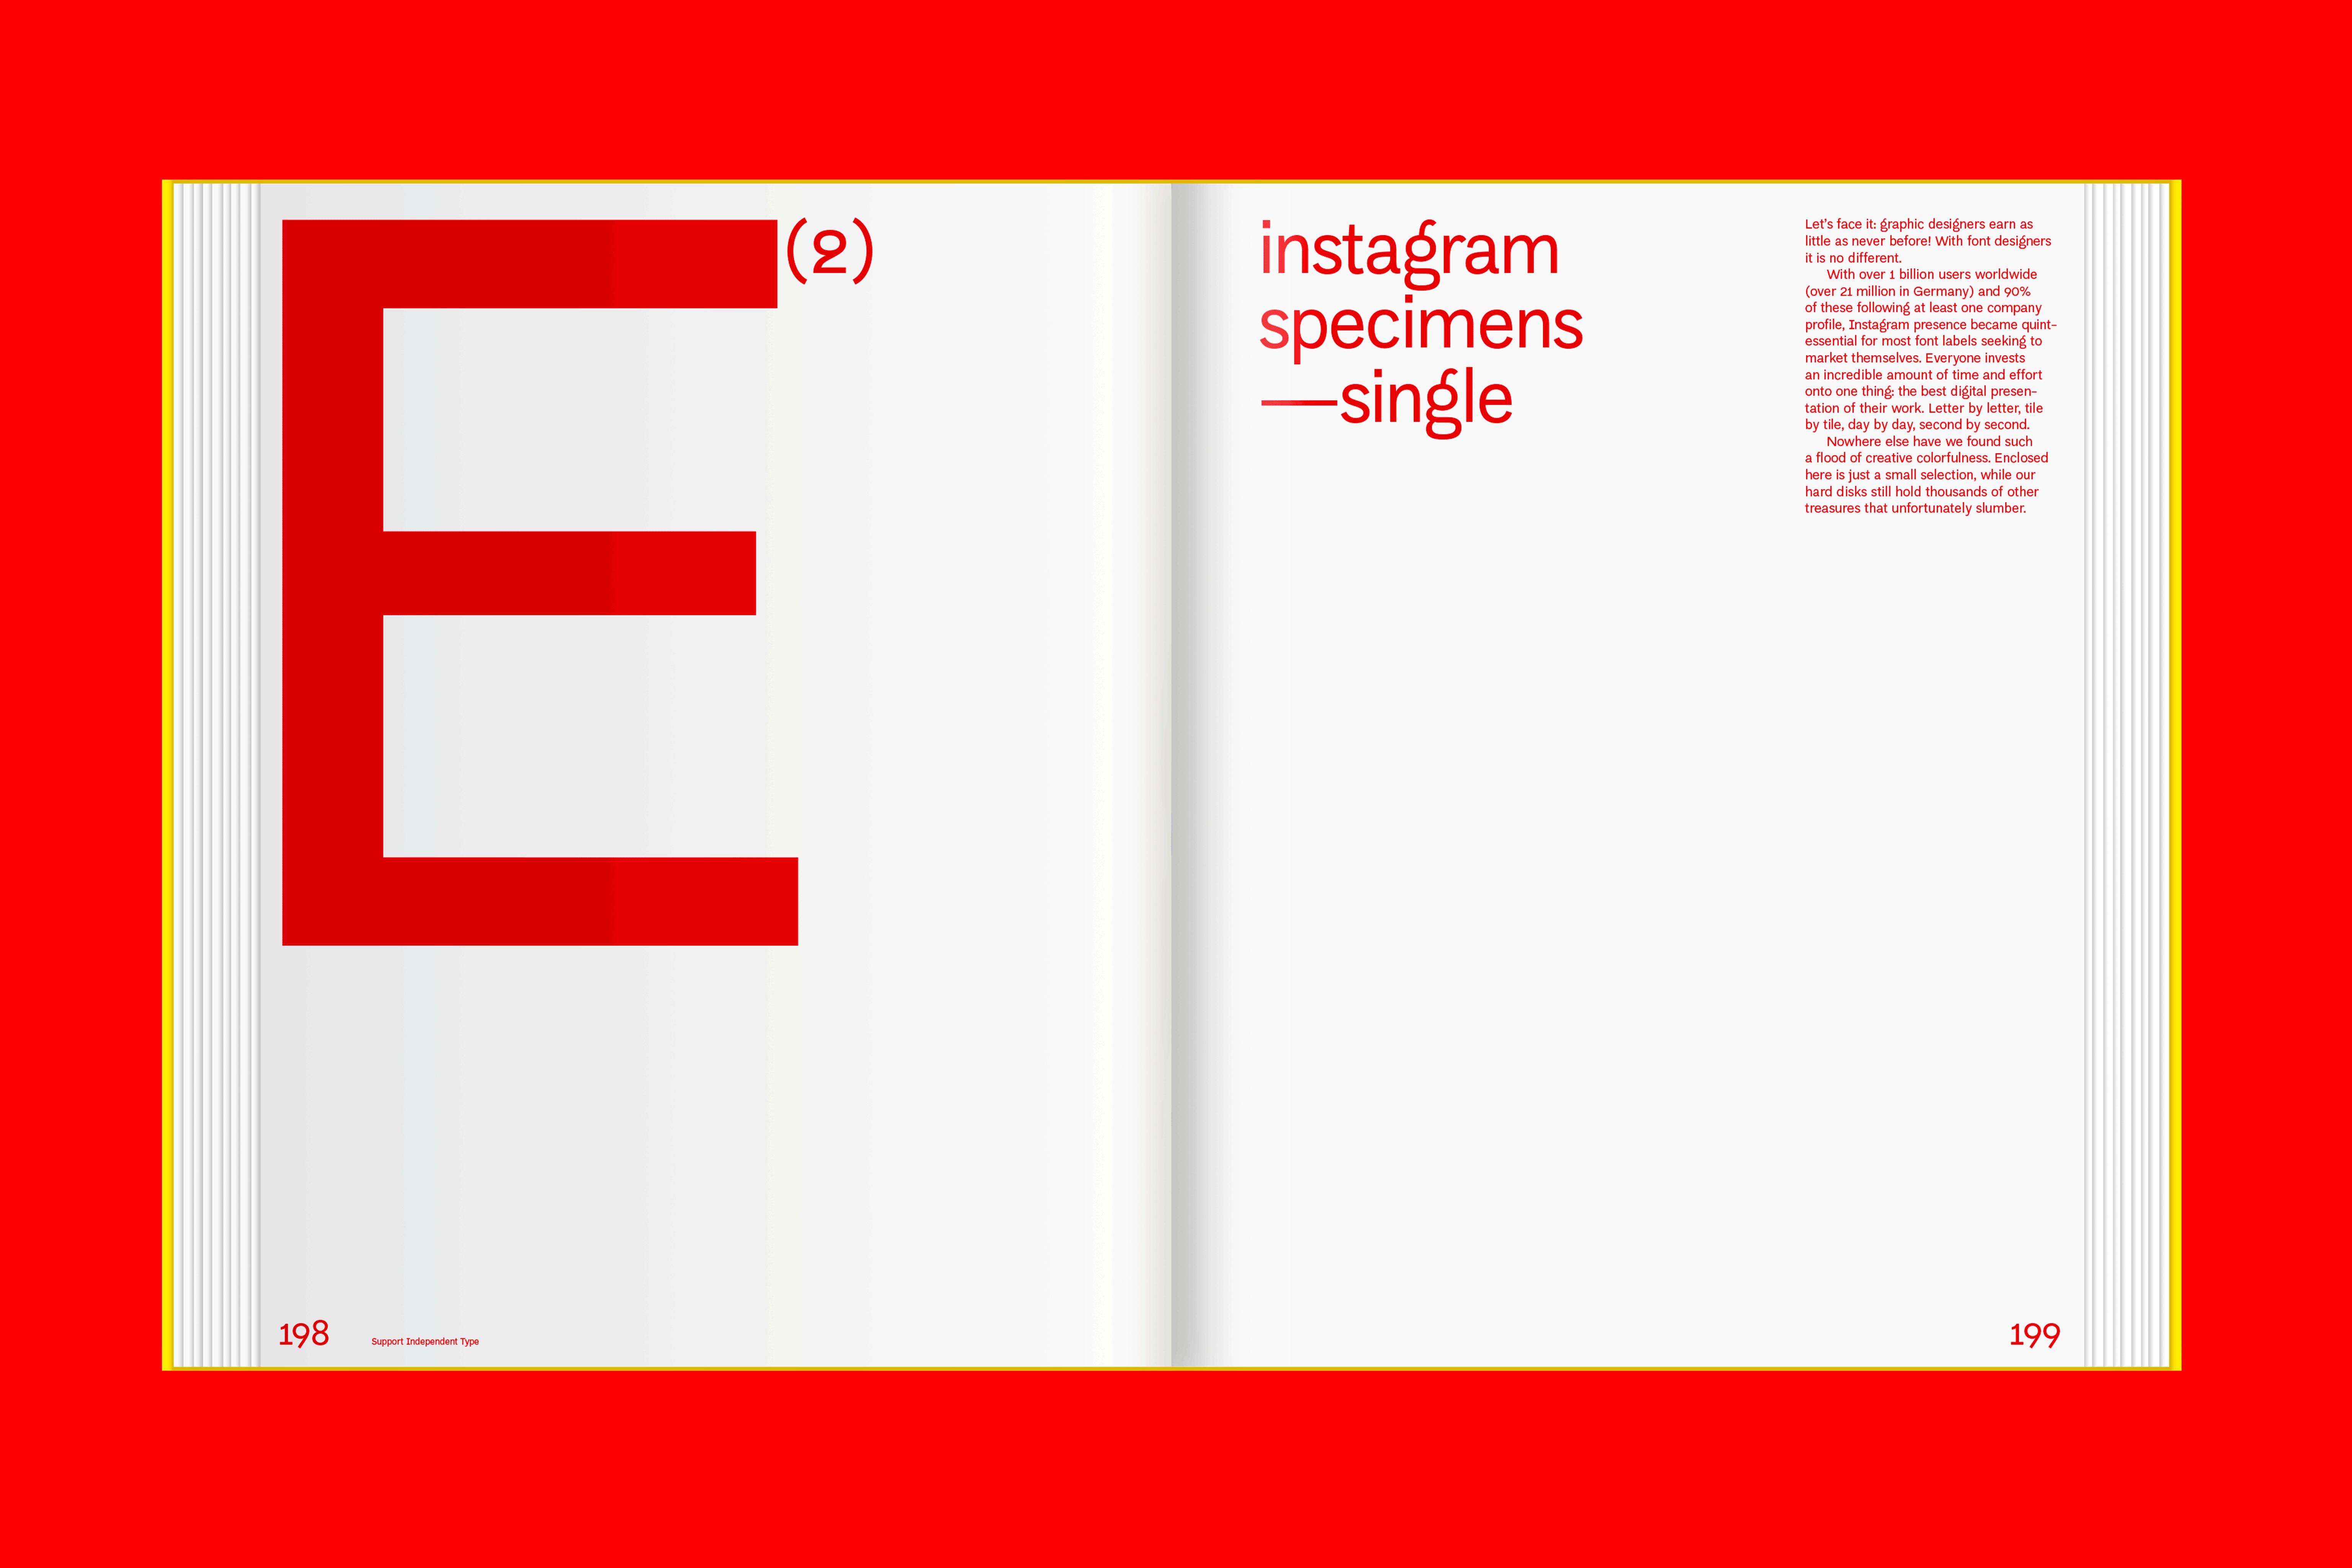 Slanted-Publiaktionen-Slanted-Publishers-Support-Independent-Type_25